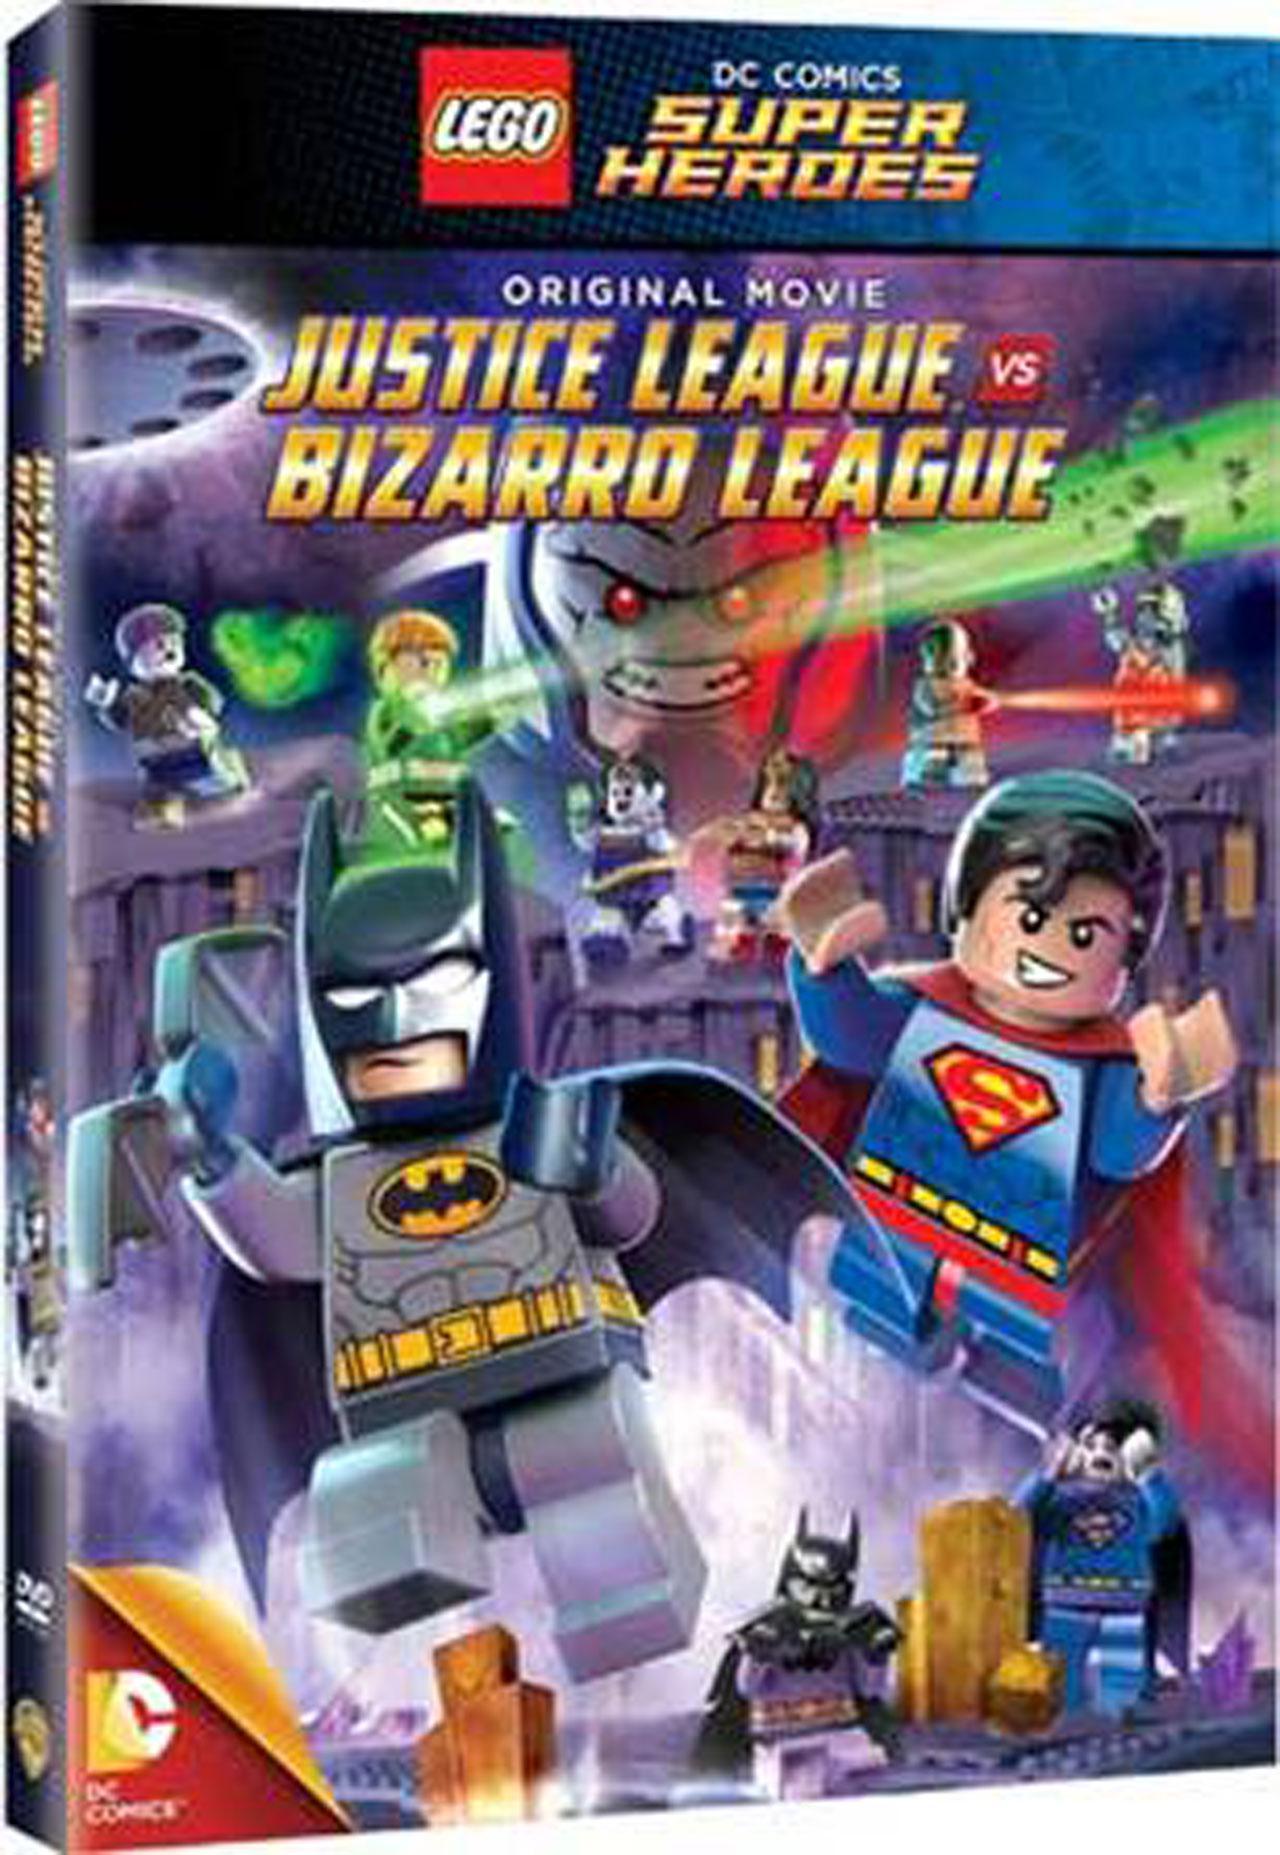 Lego Batman : JL vs Bizarro League : เลโก้ แบทแมน : จัสติซ ลีก ปะทะ บิซาโร่ ลีก